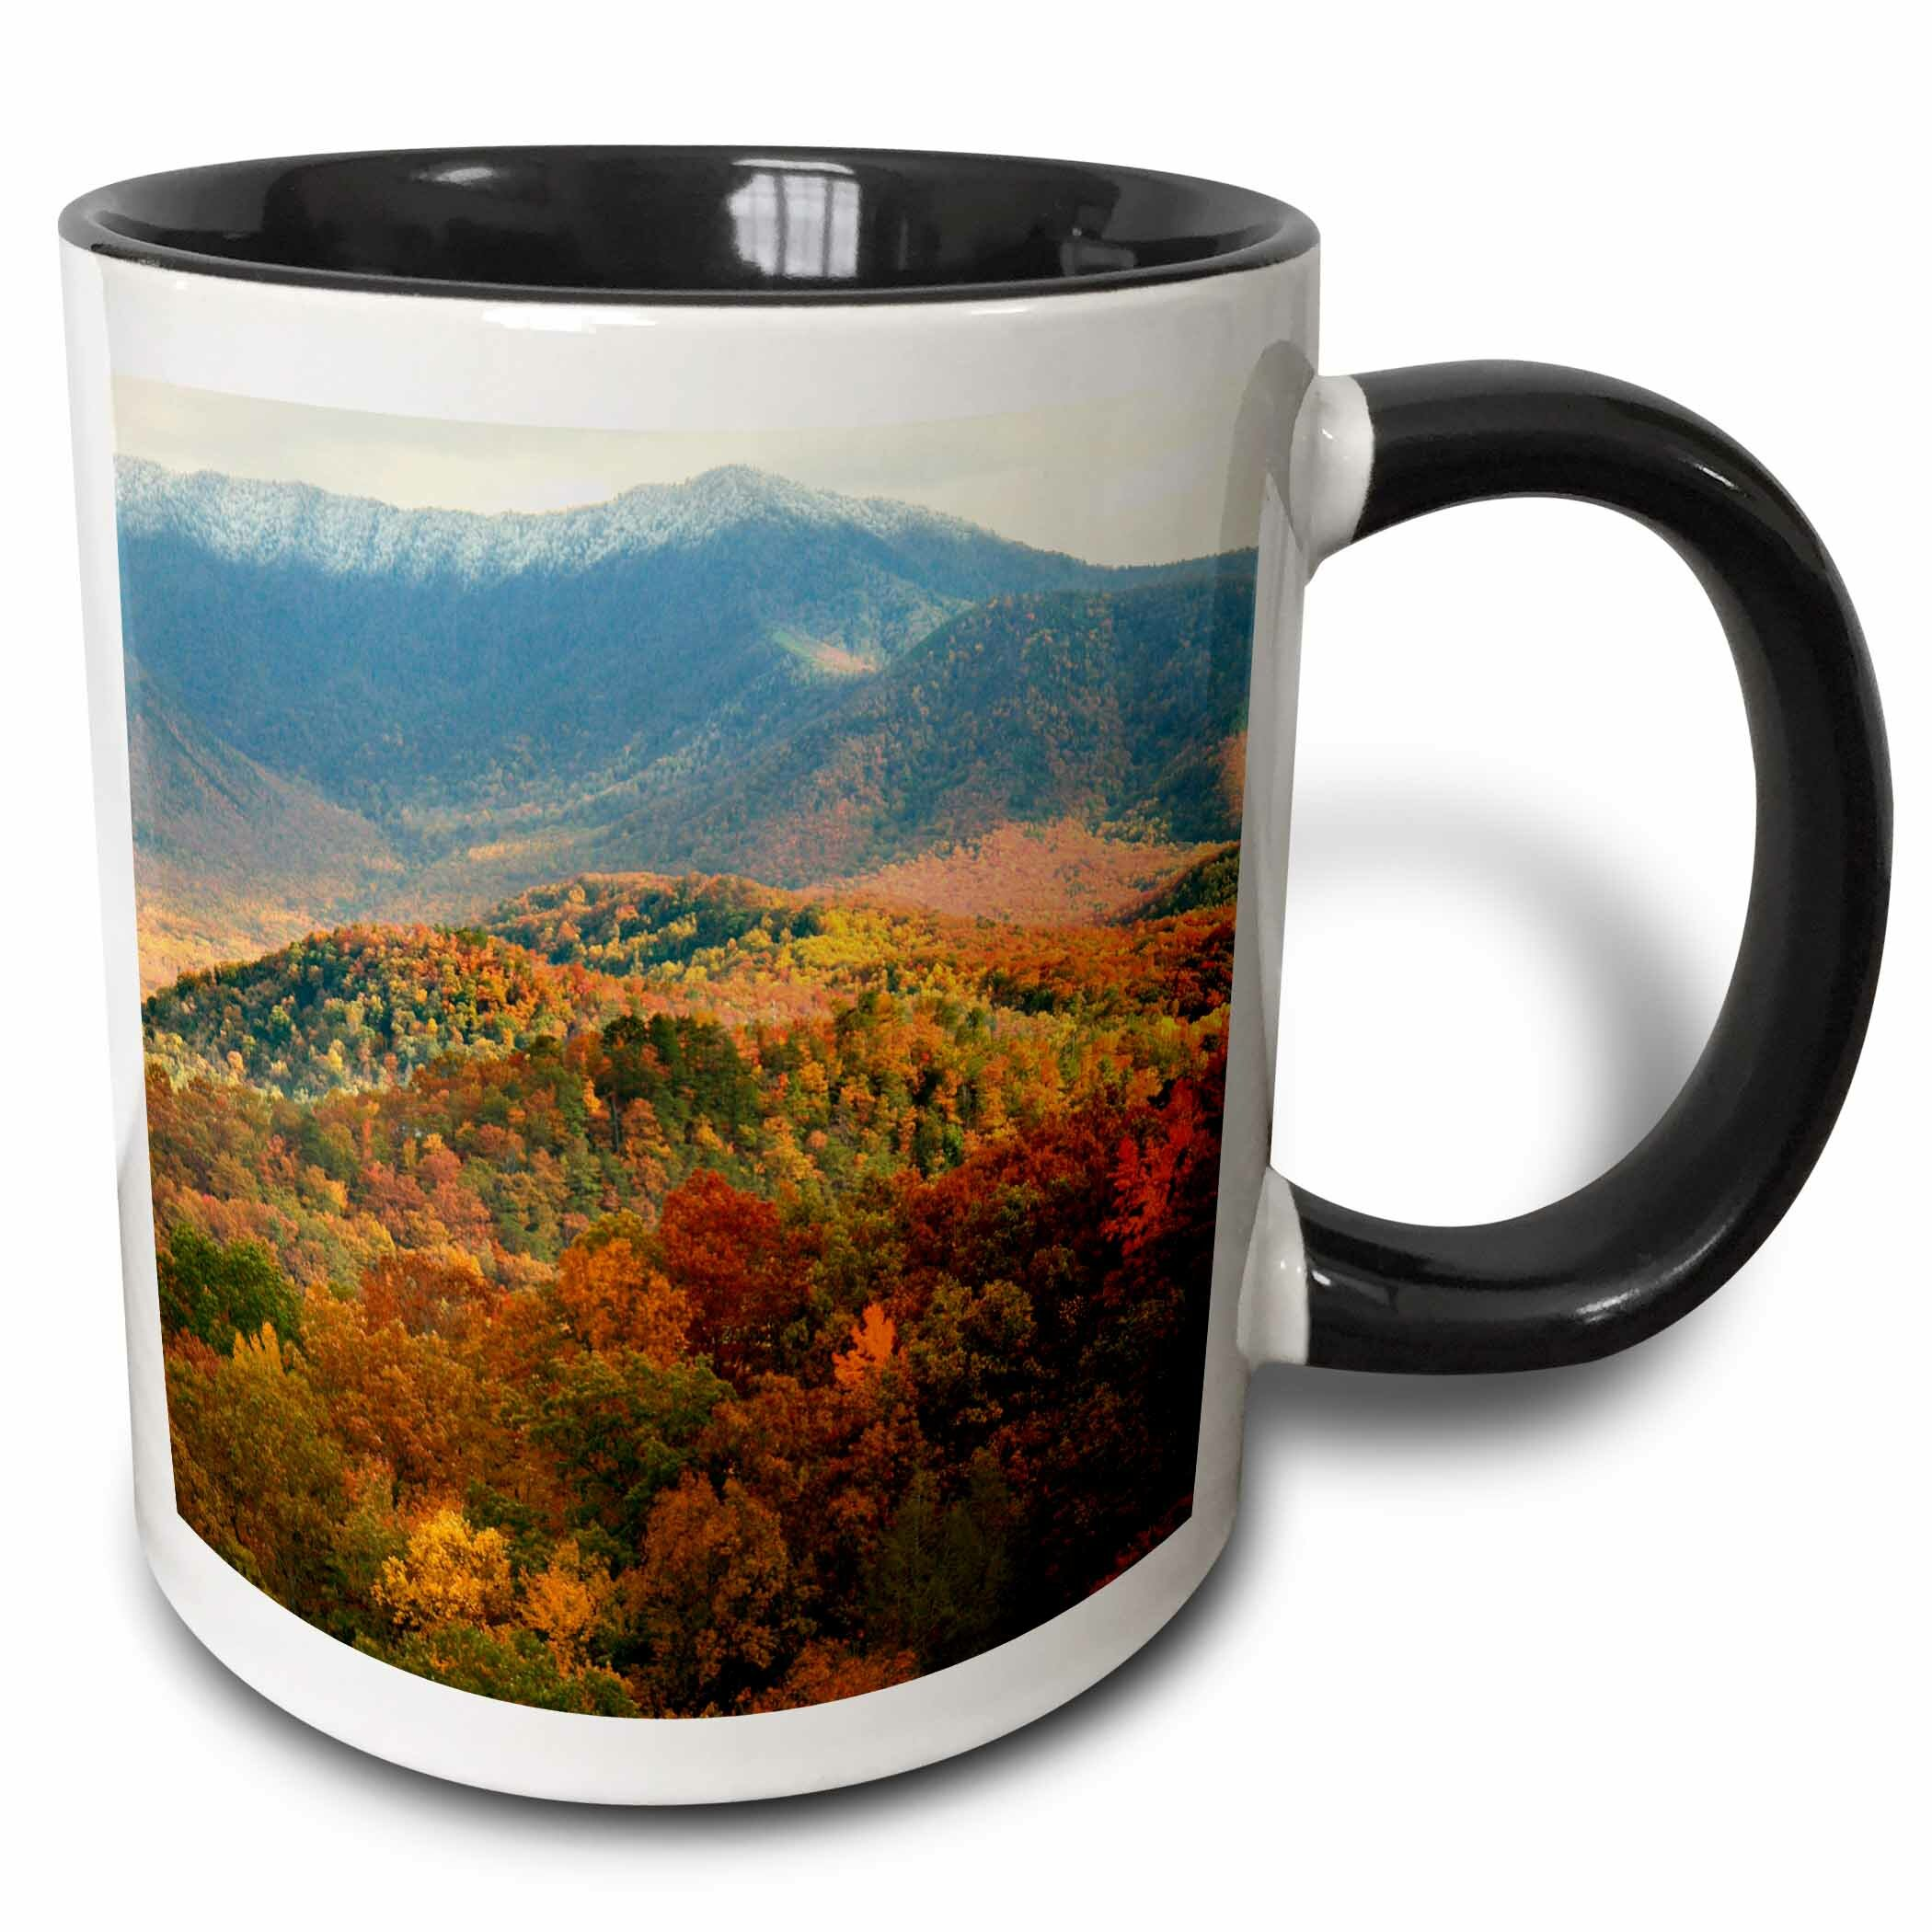 Ebern Designs Blix Mount Leconte Above Fall Foliage In The Valleys Coffee Mug Wayfair